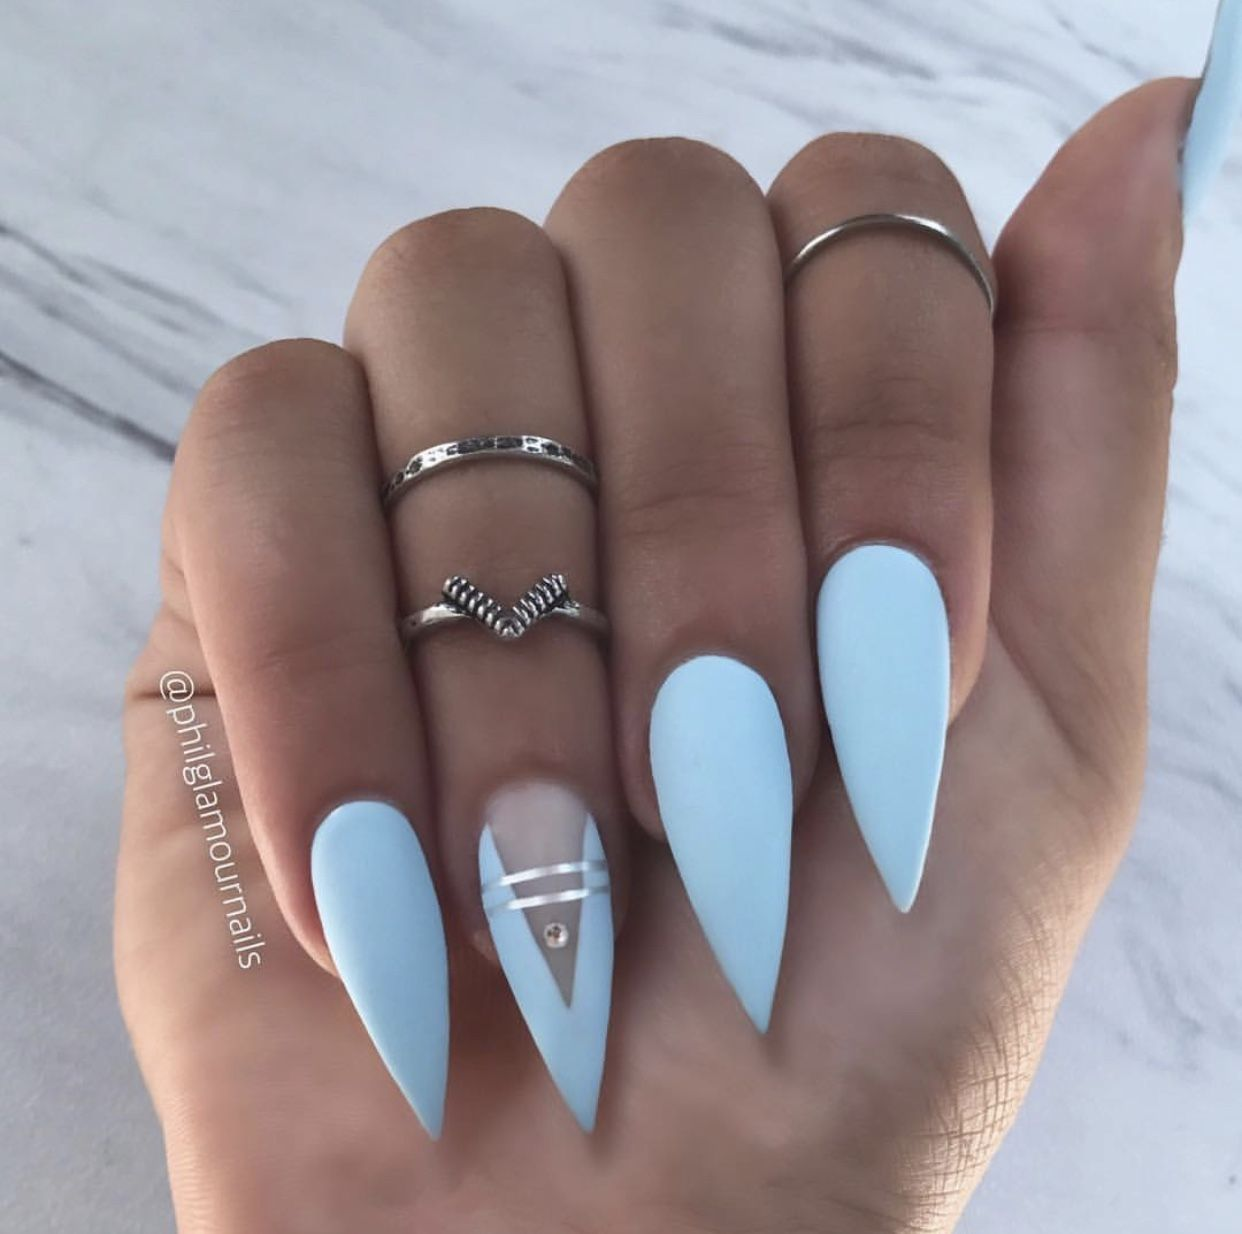 Follow Me Jouan008 On Pinterest For More Fashions Fashionistas Plussizefashion Fashion Womenfashio Sky Blue Nails Sky Blue Nail Designs Blue Nail Designs